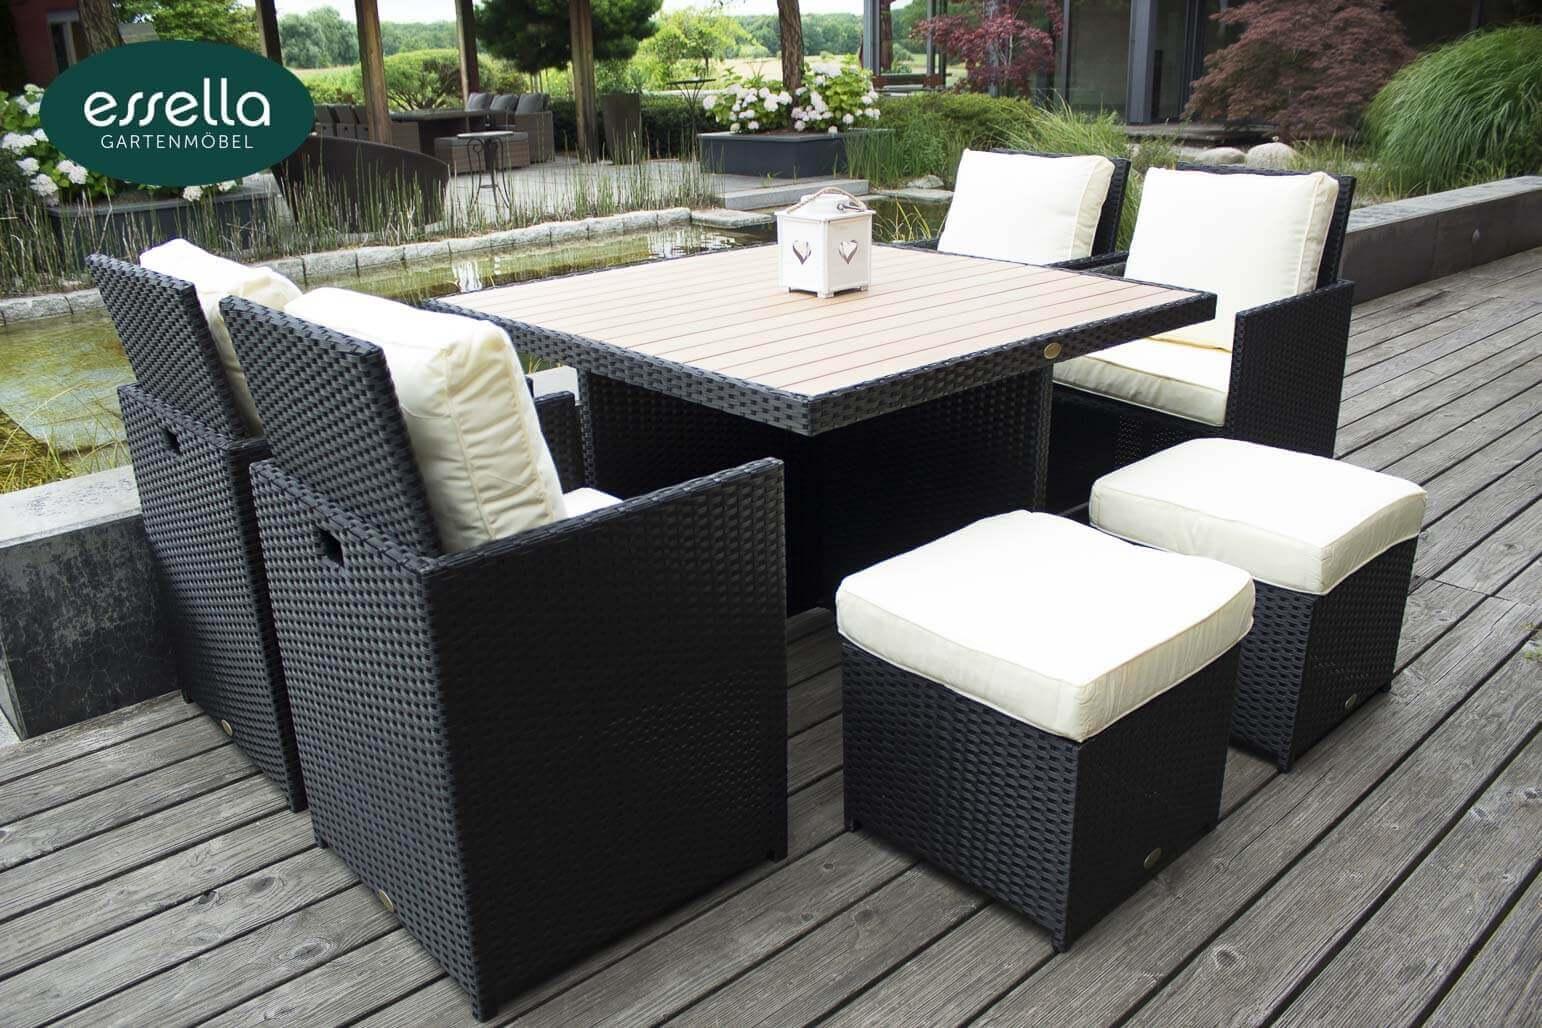 essella polyrattan sitzgruppe vienna 4 personen polywood flachgeflecht. Black Bedroom Furniture Sets. Home Design Ideas